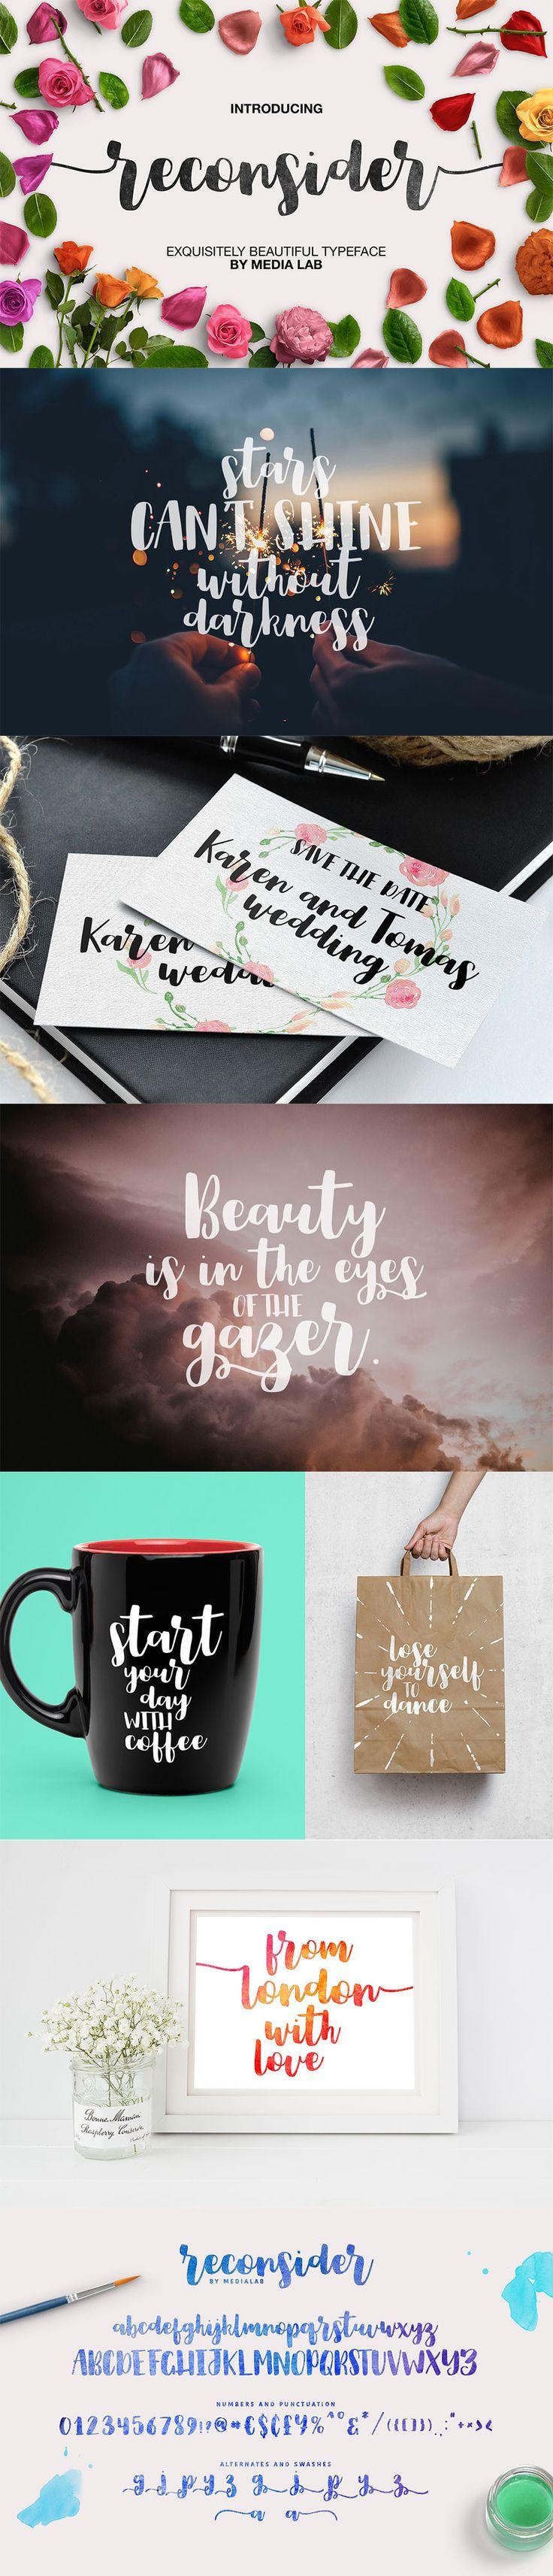 cursive fonts for wedding cards%0A    Fresh Fonts for       Only       MyDesignDeals  Calligraphy FontsScript  FontsWedding CardsWedding